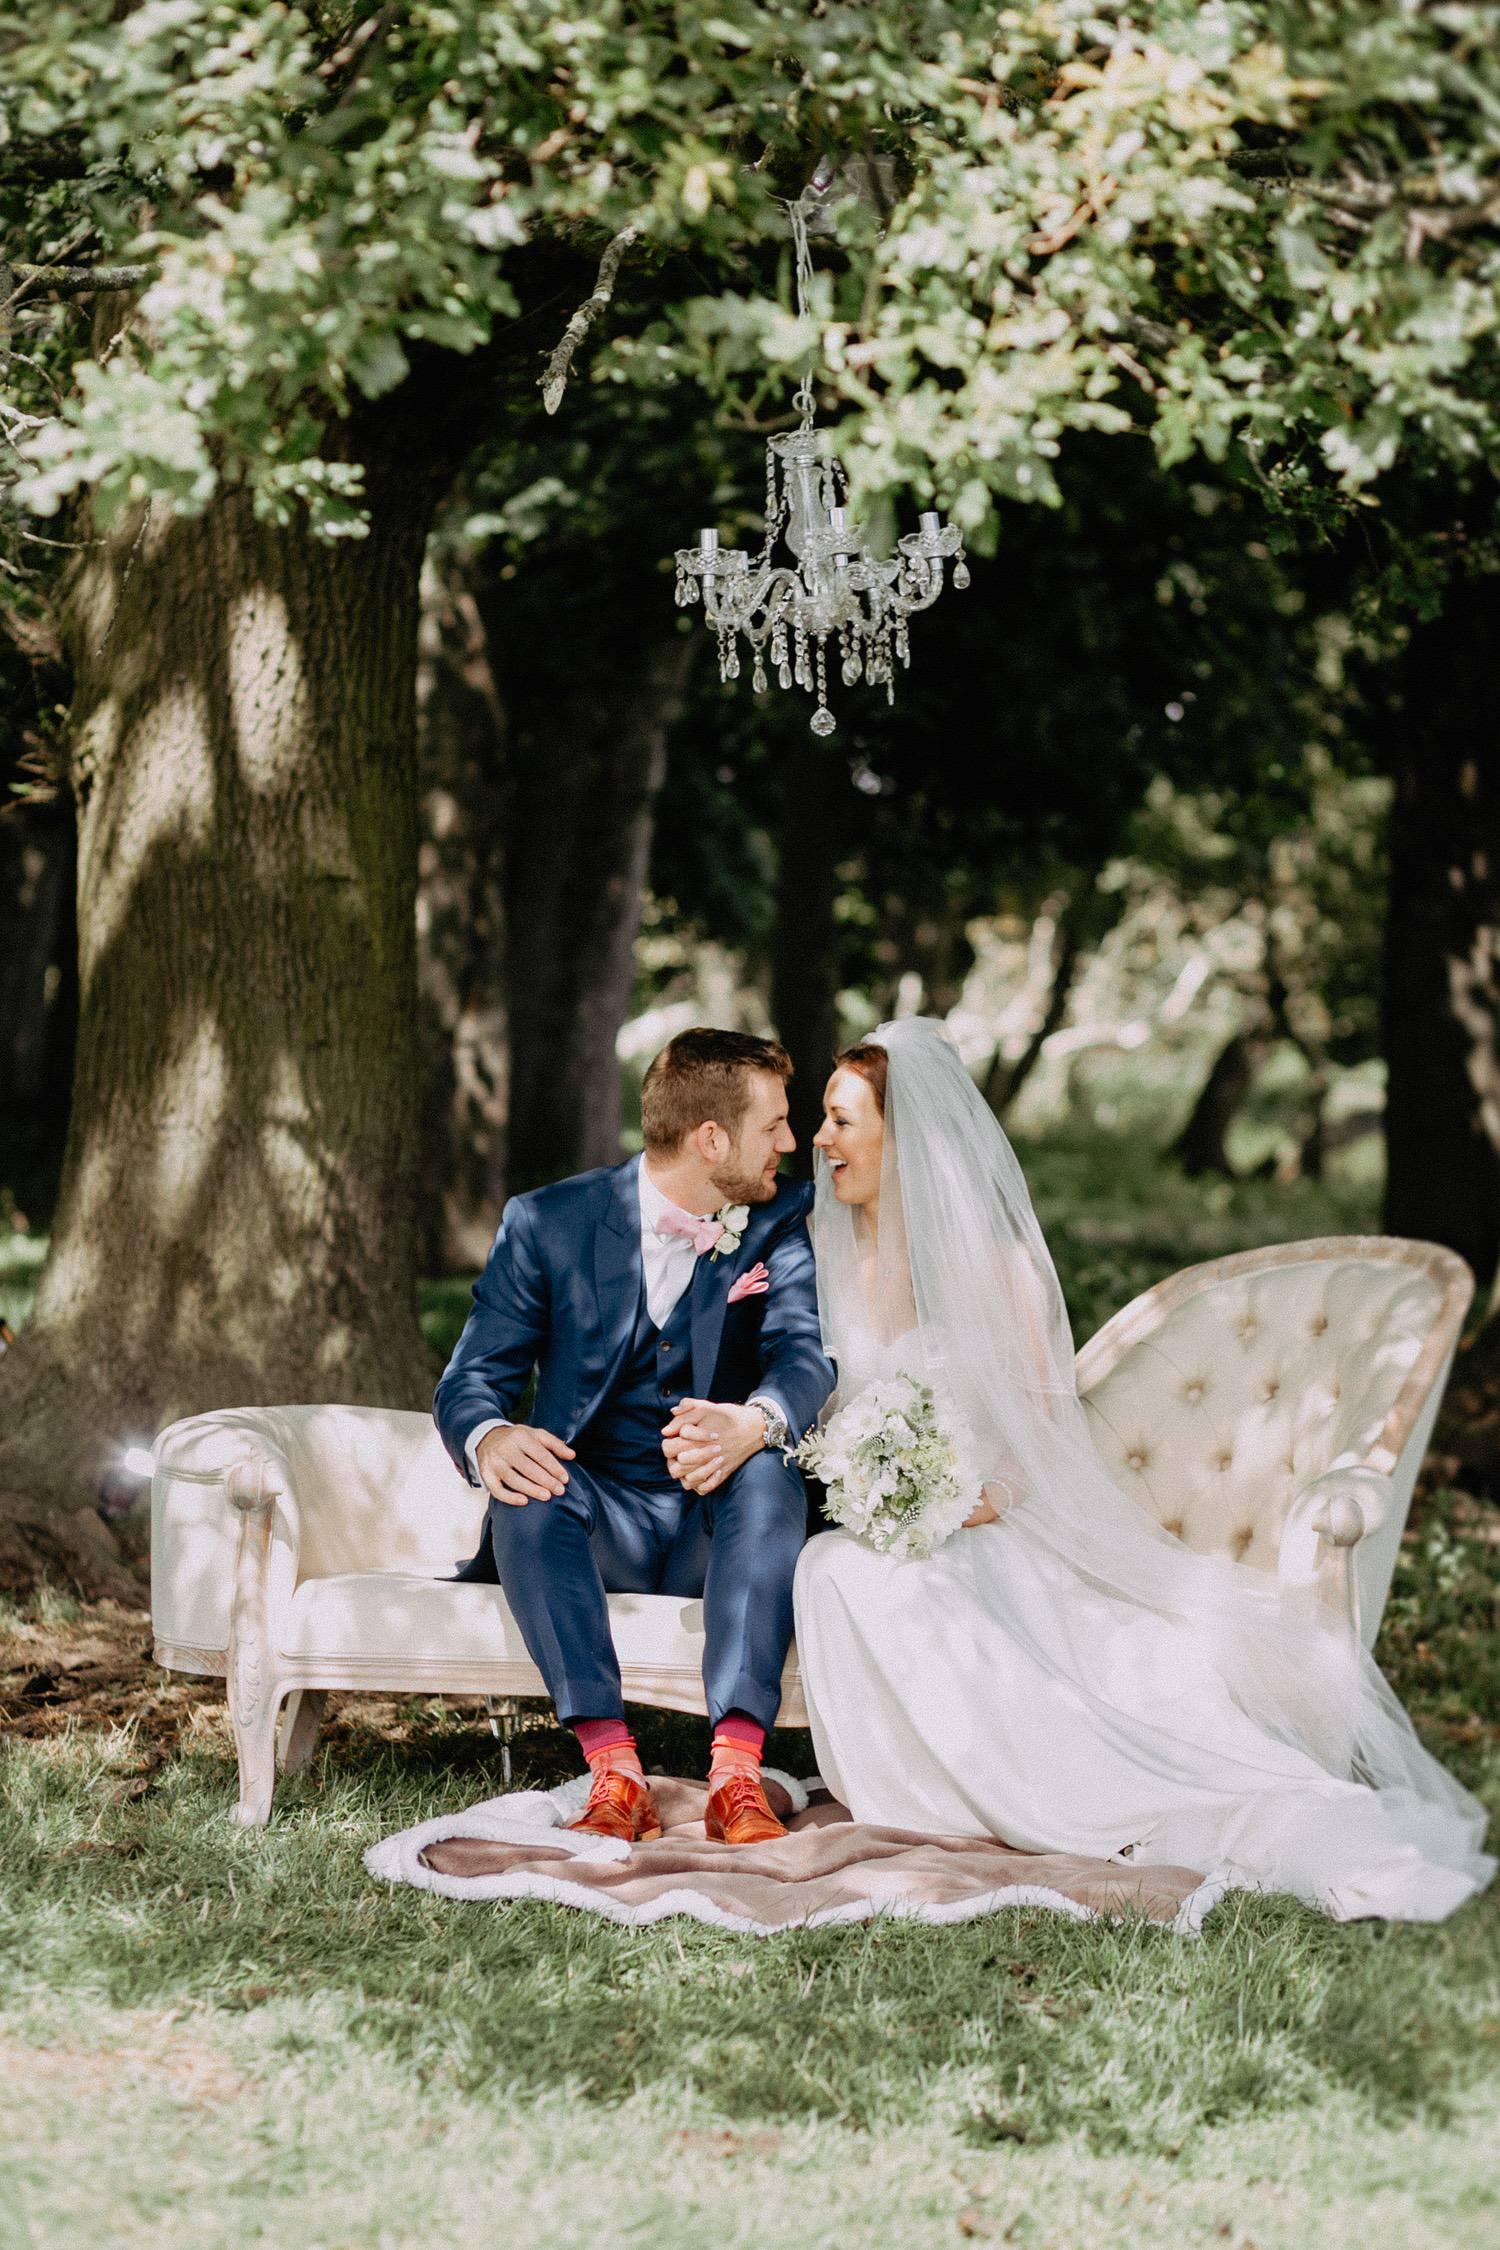 Natural-Retreats-Yorkshire-Wedding-Photographer-52.jpg